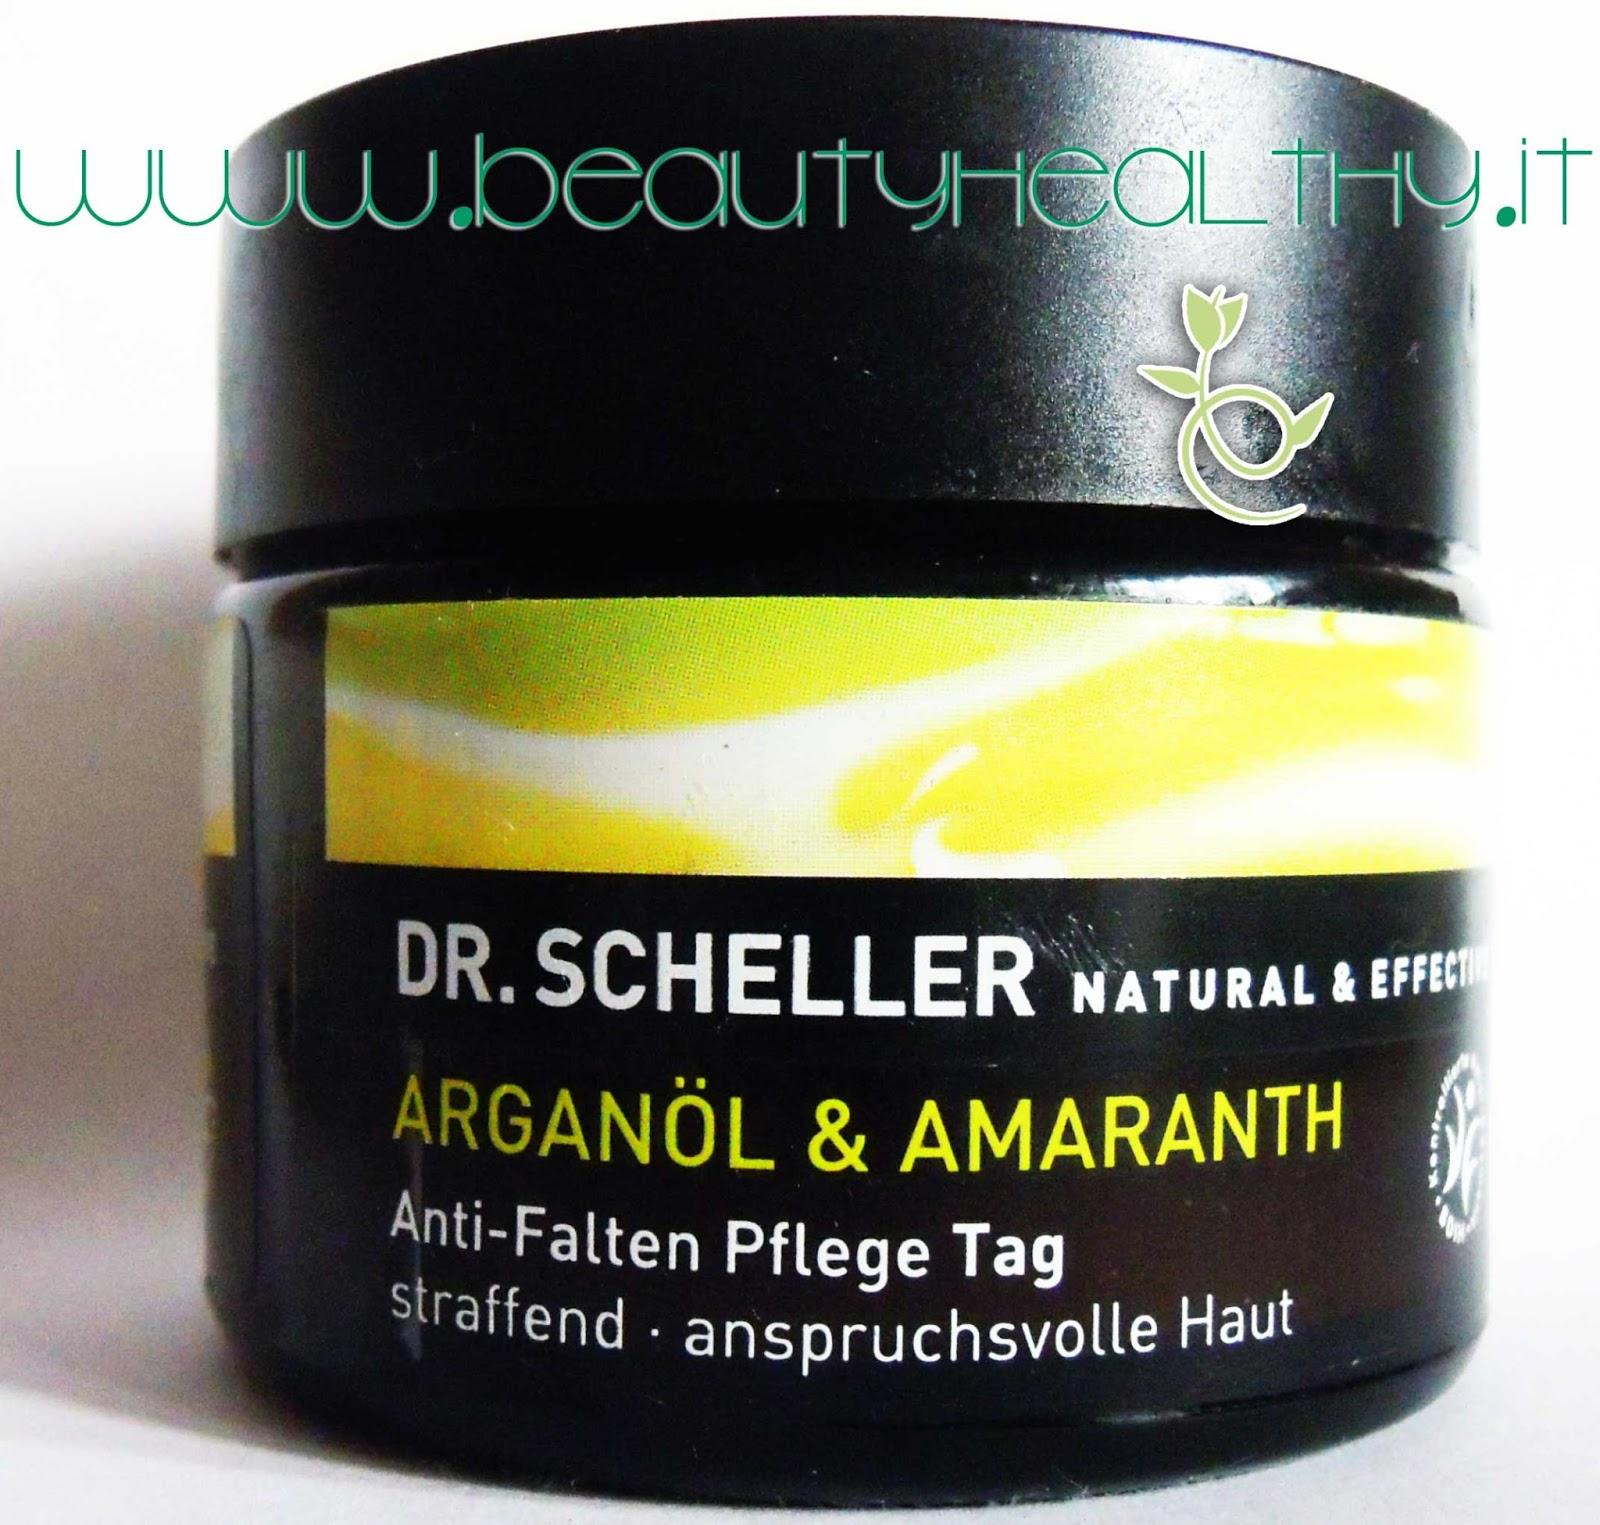 dr. scheller crema giorno antirughe argan amaranto